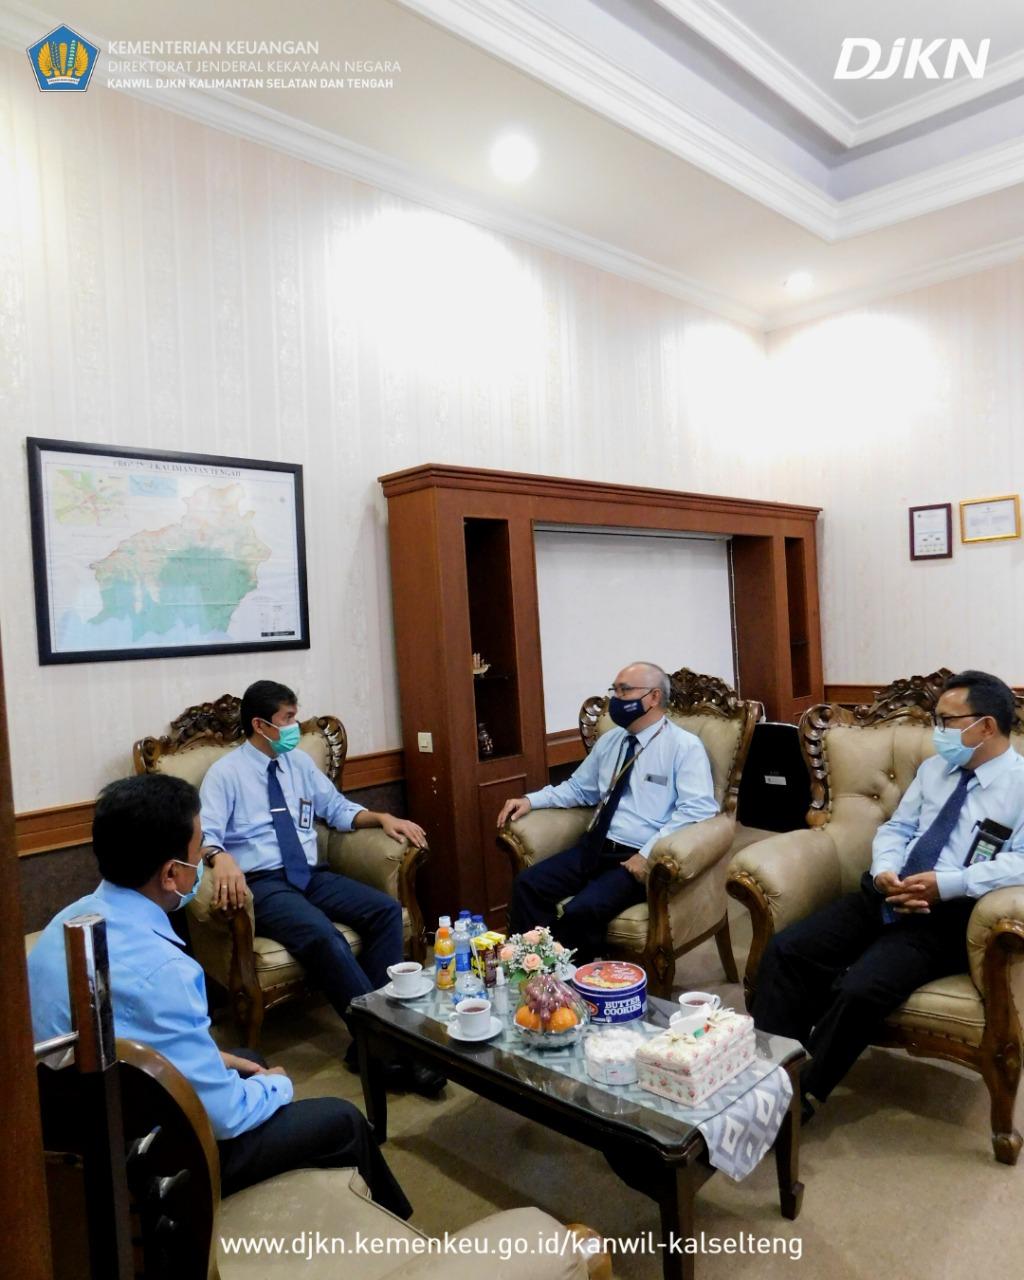 Kunjungan Kerja, Kepala Kanwil DJKN Kalselteng: Kuatkan Koordinasi dan Jalin Sinergi